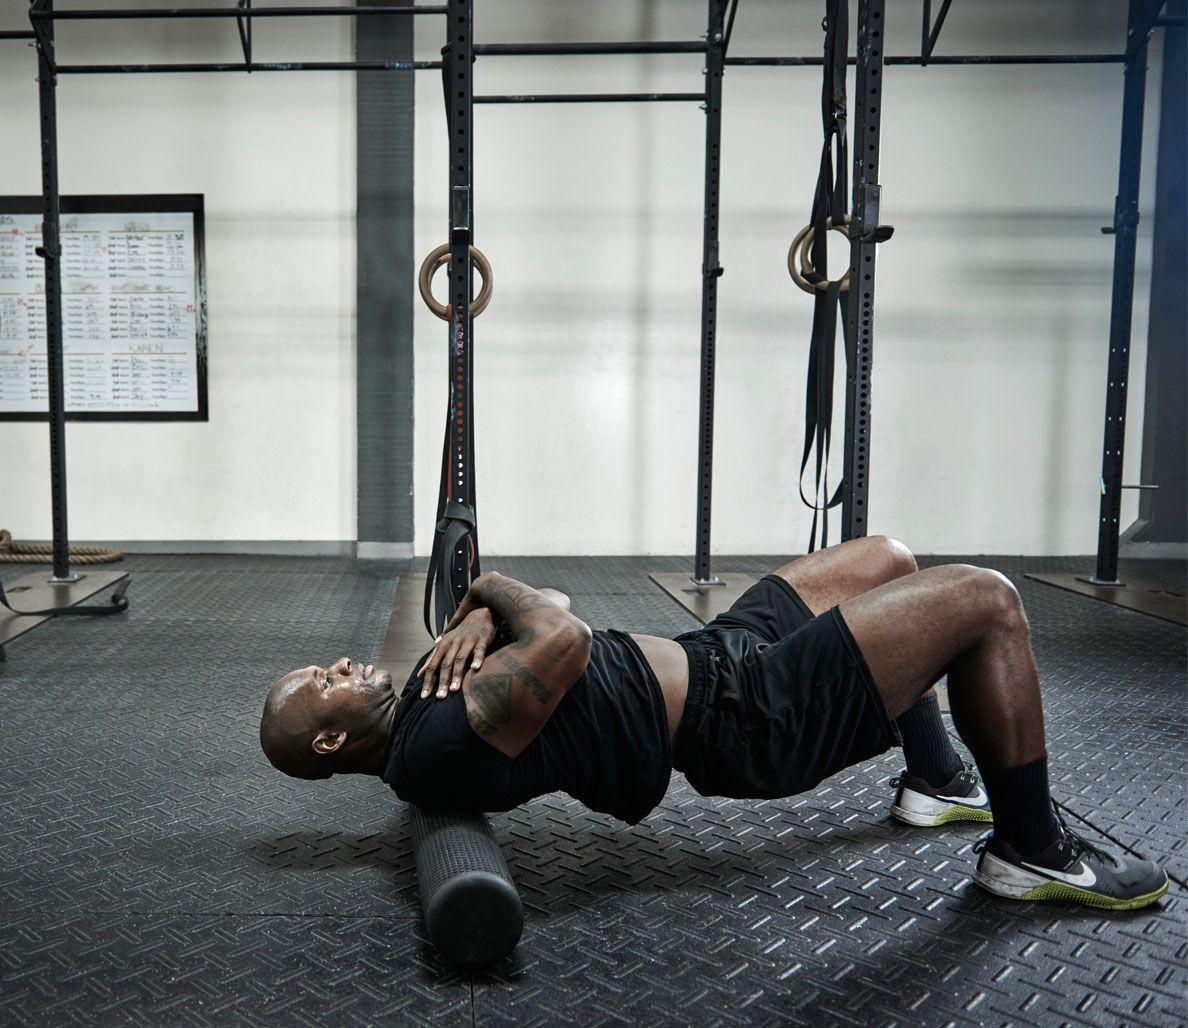 Endurance Training: Pin By Strength Emporium On Bodybuilding